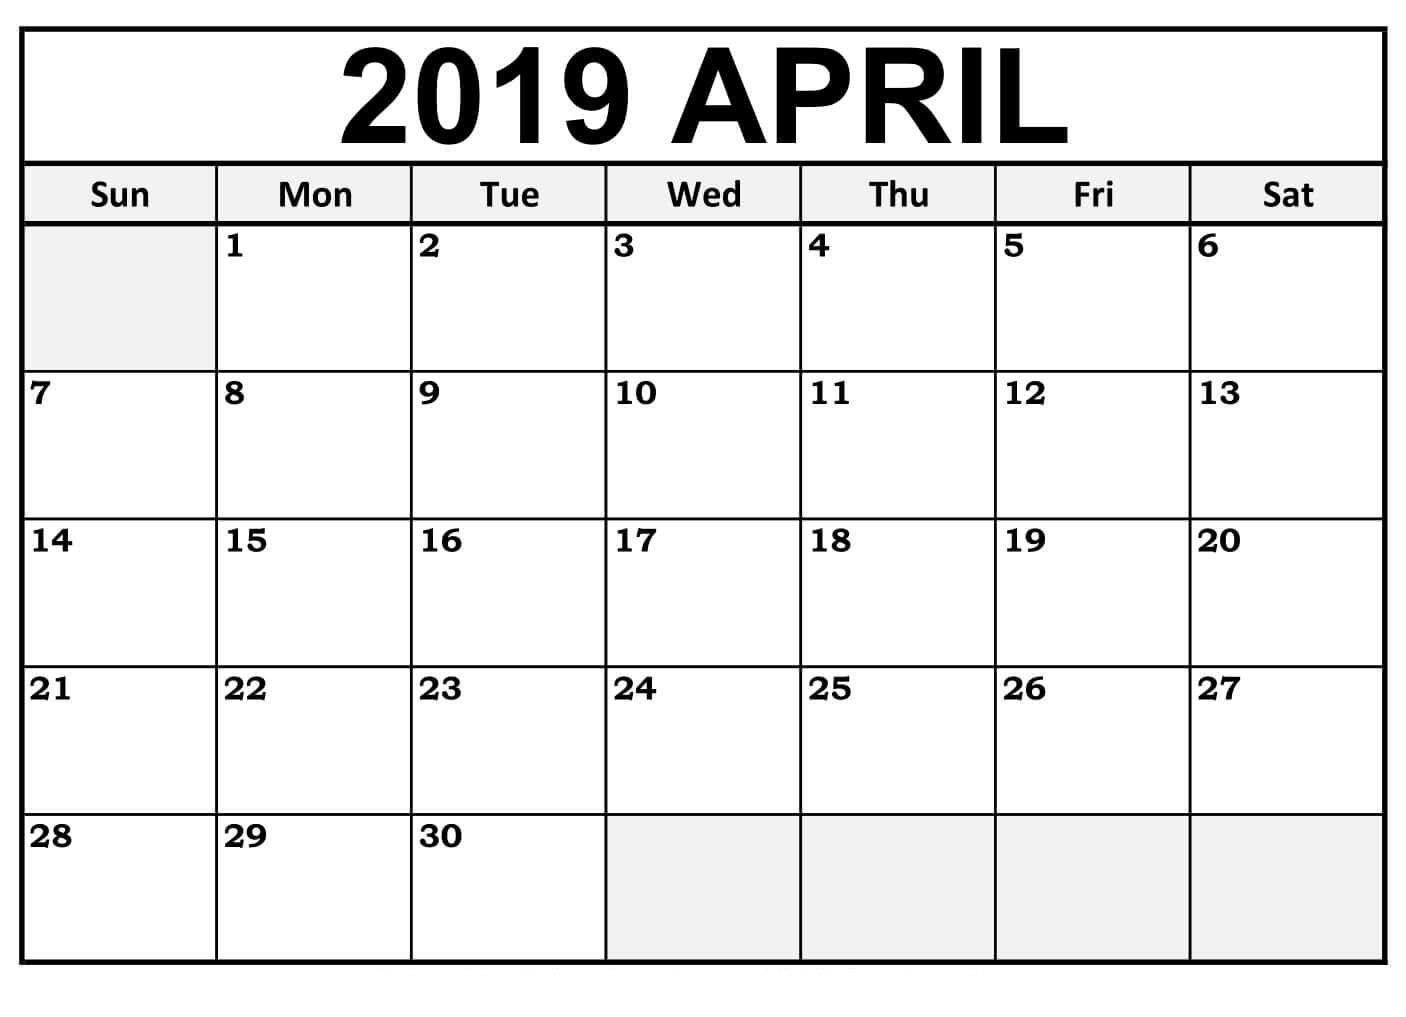 Free Printable April 2019 Calendar Downloadable #tumblr #twitter #fb - Free Printable Facebook Template